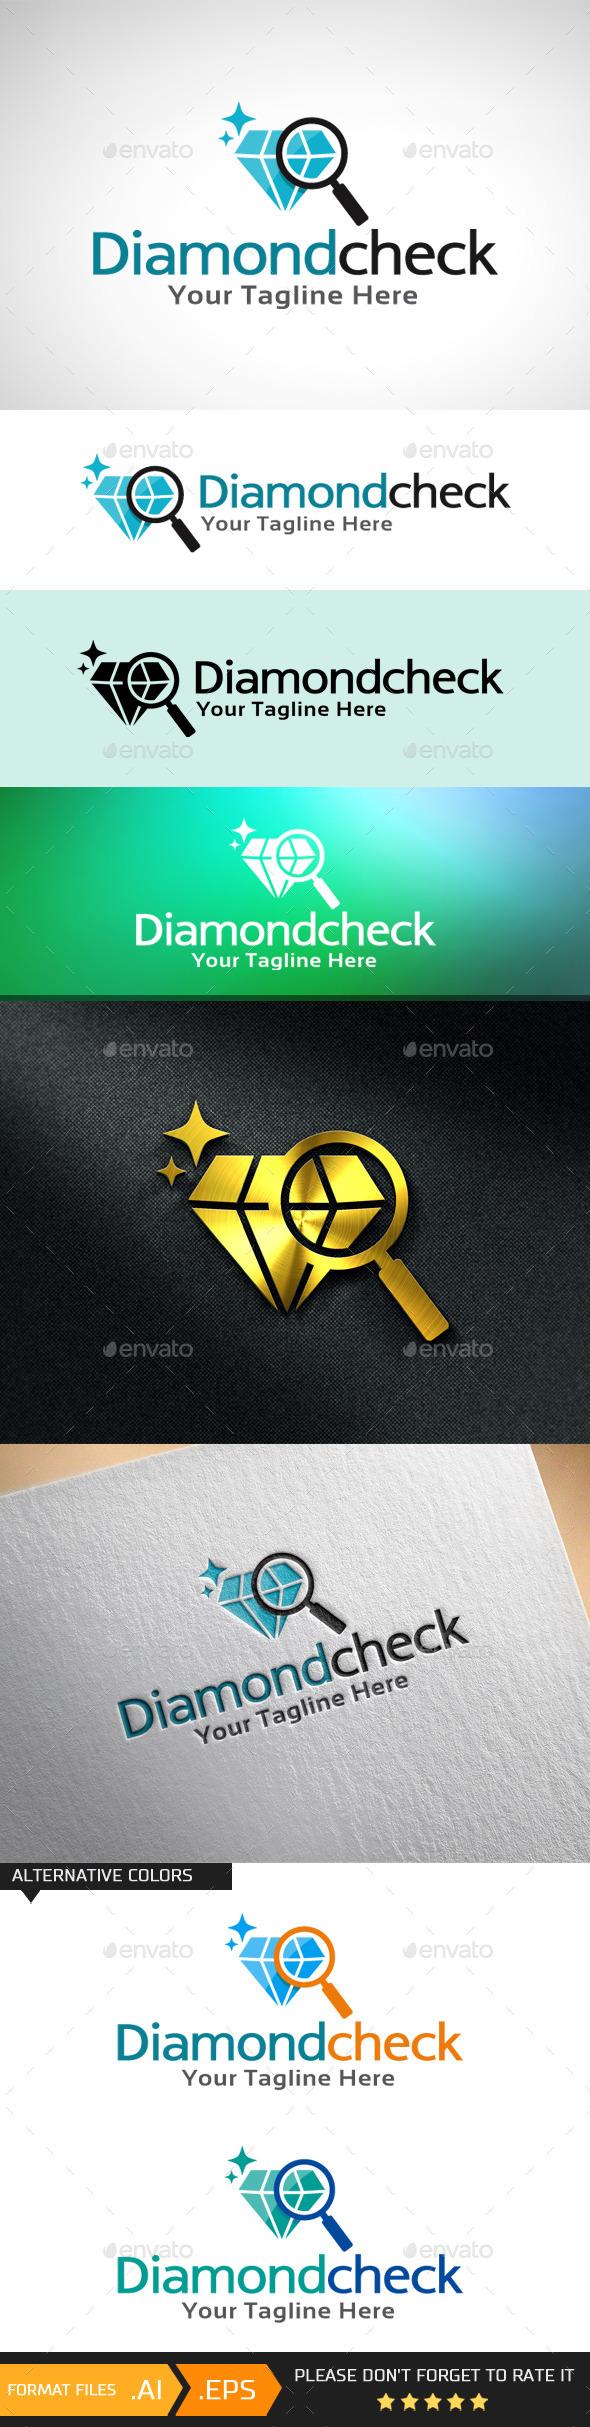 Diamond Check Logo Template - Objects Logo Templates